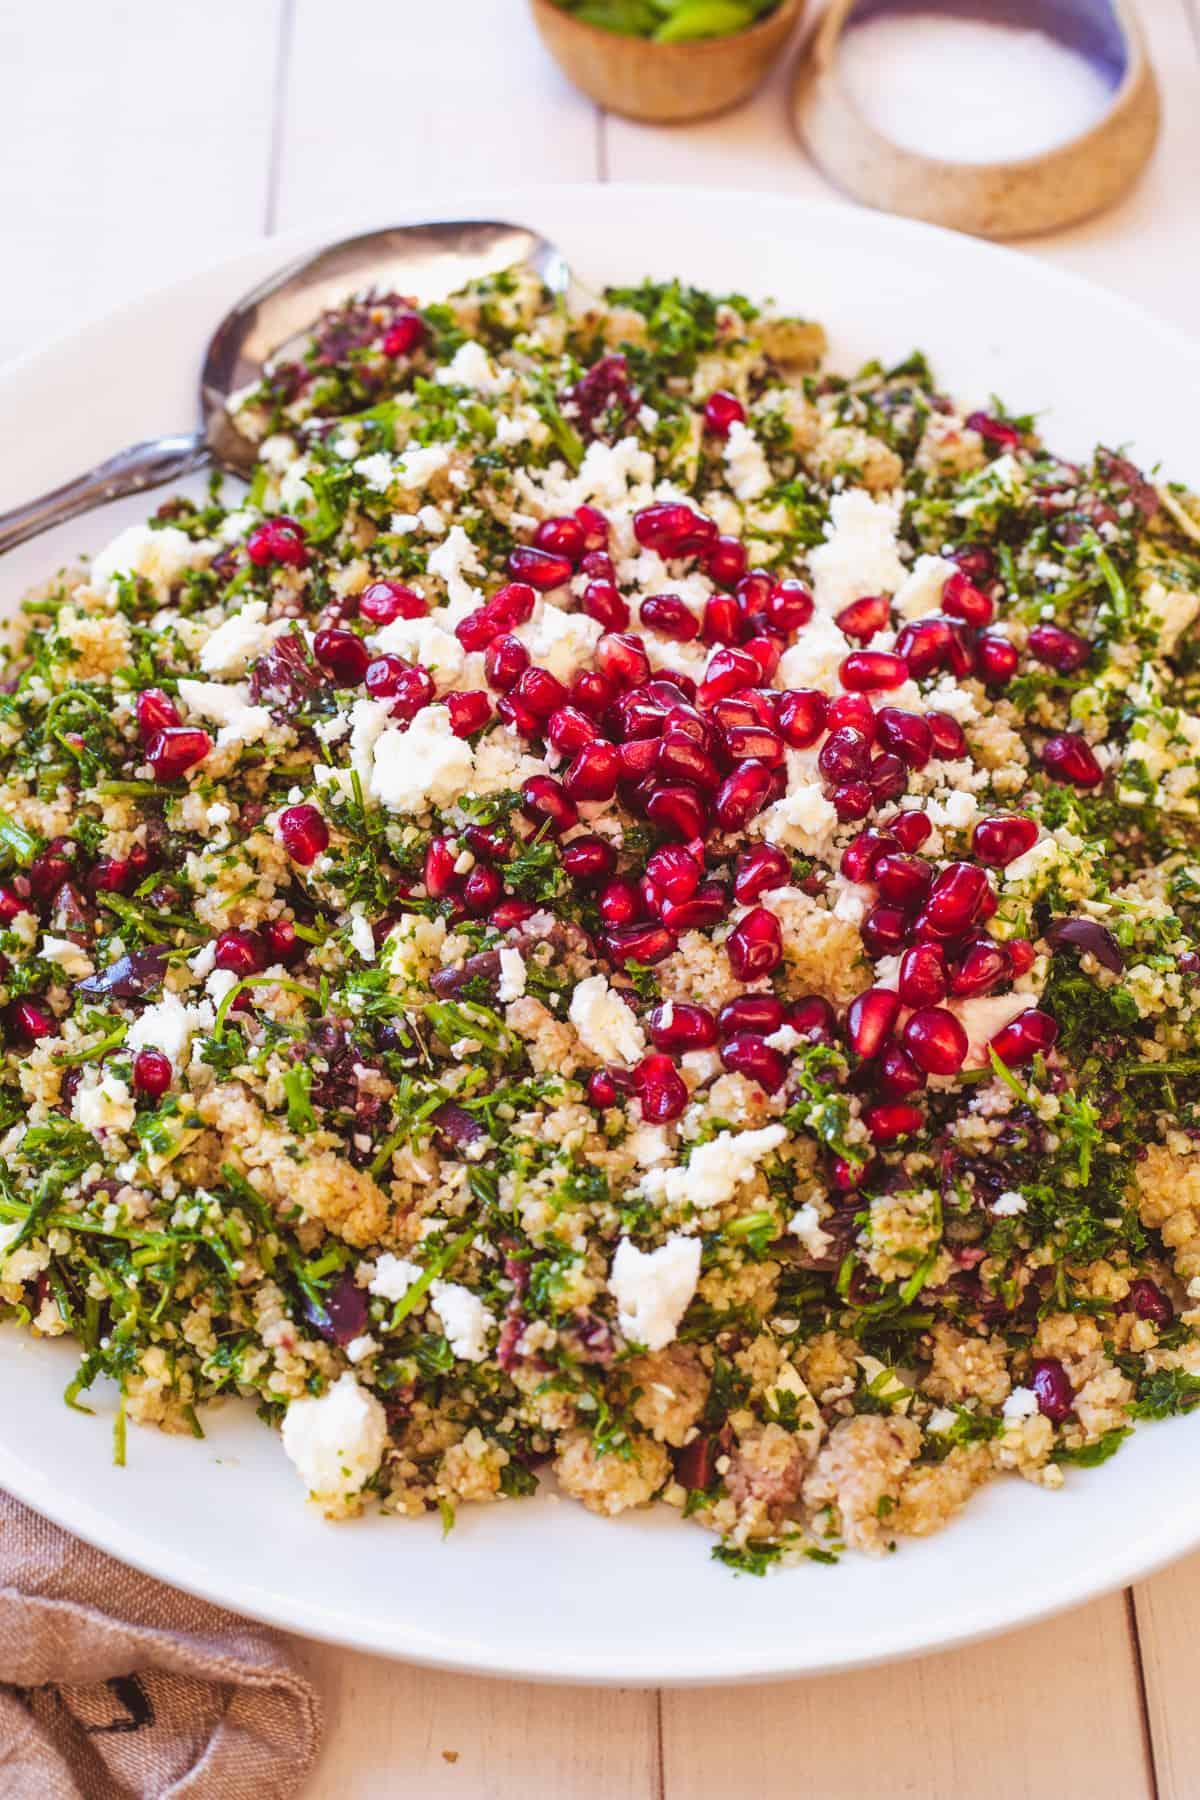 bulgur salad with serving spoon